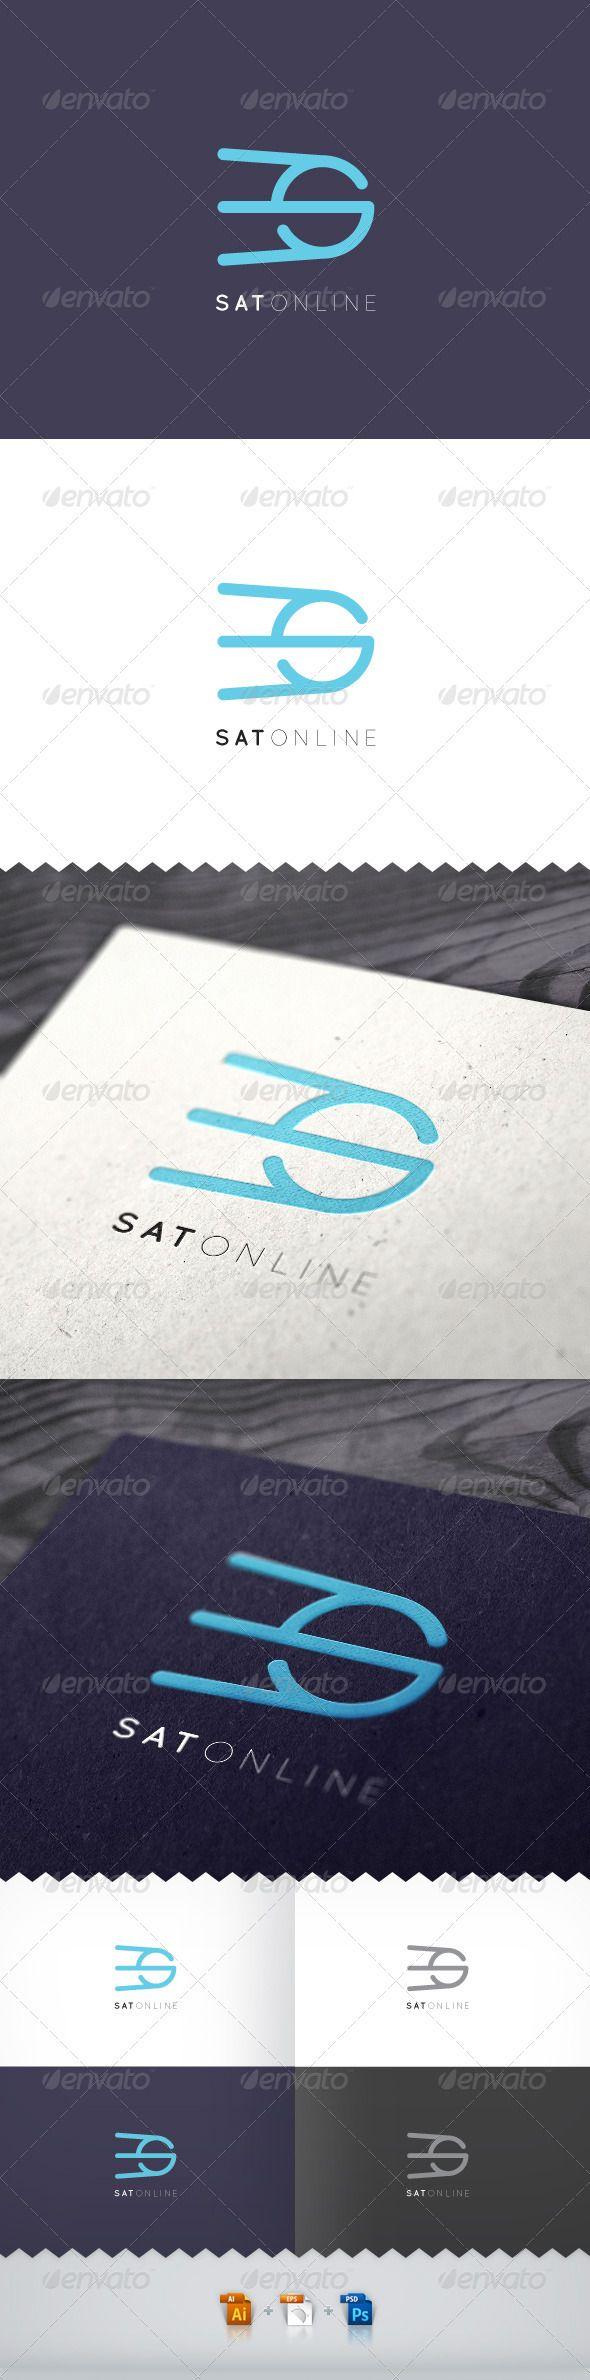 Sat Online Logo — Photoshop PSD #online #shape • Available here → https://graphicriver.net/item/sat-online-logo/2005158?ref=pxcr